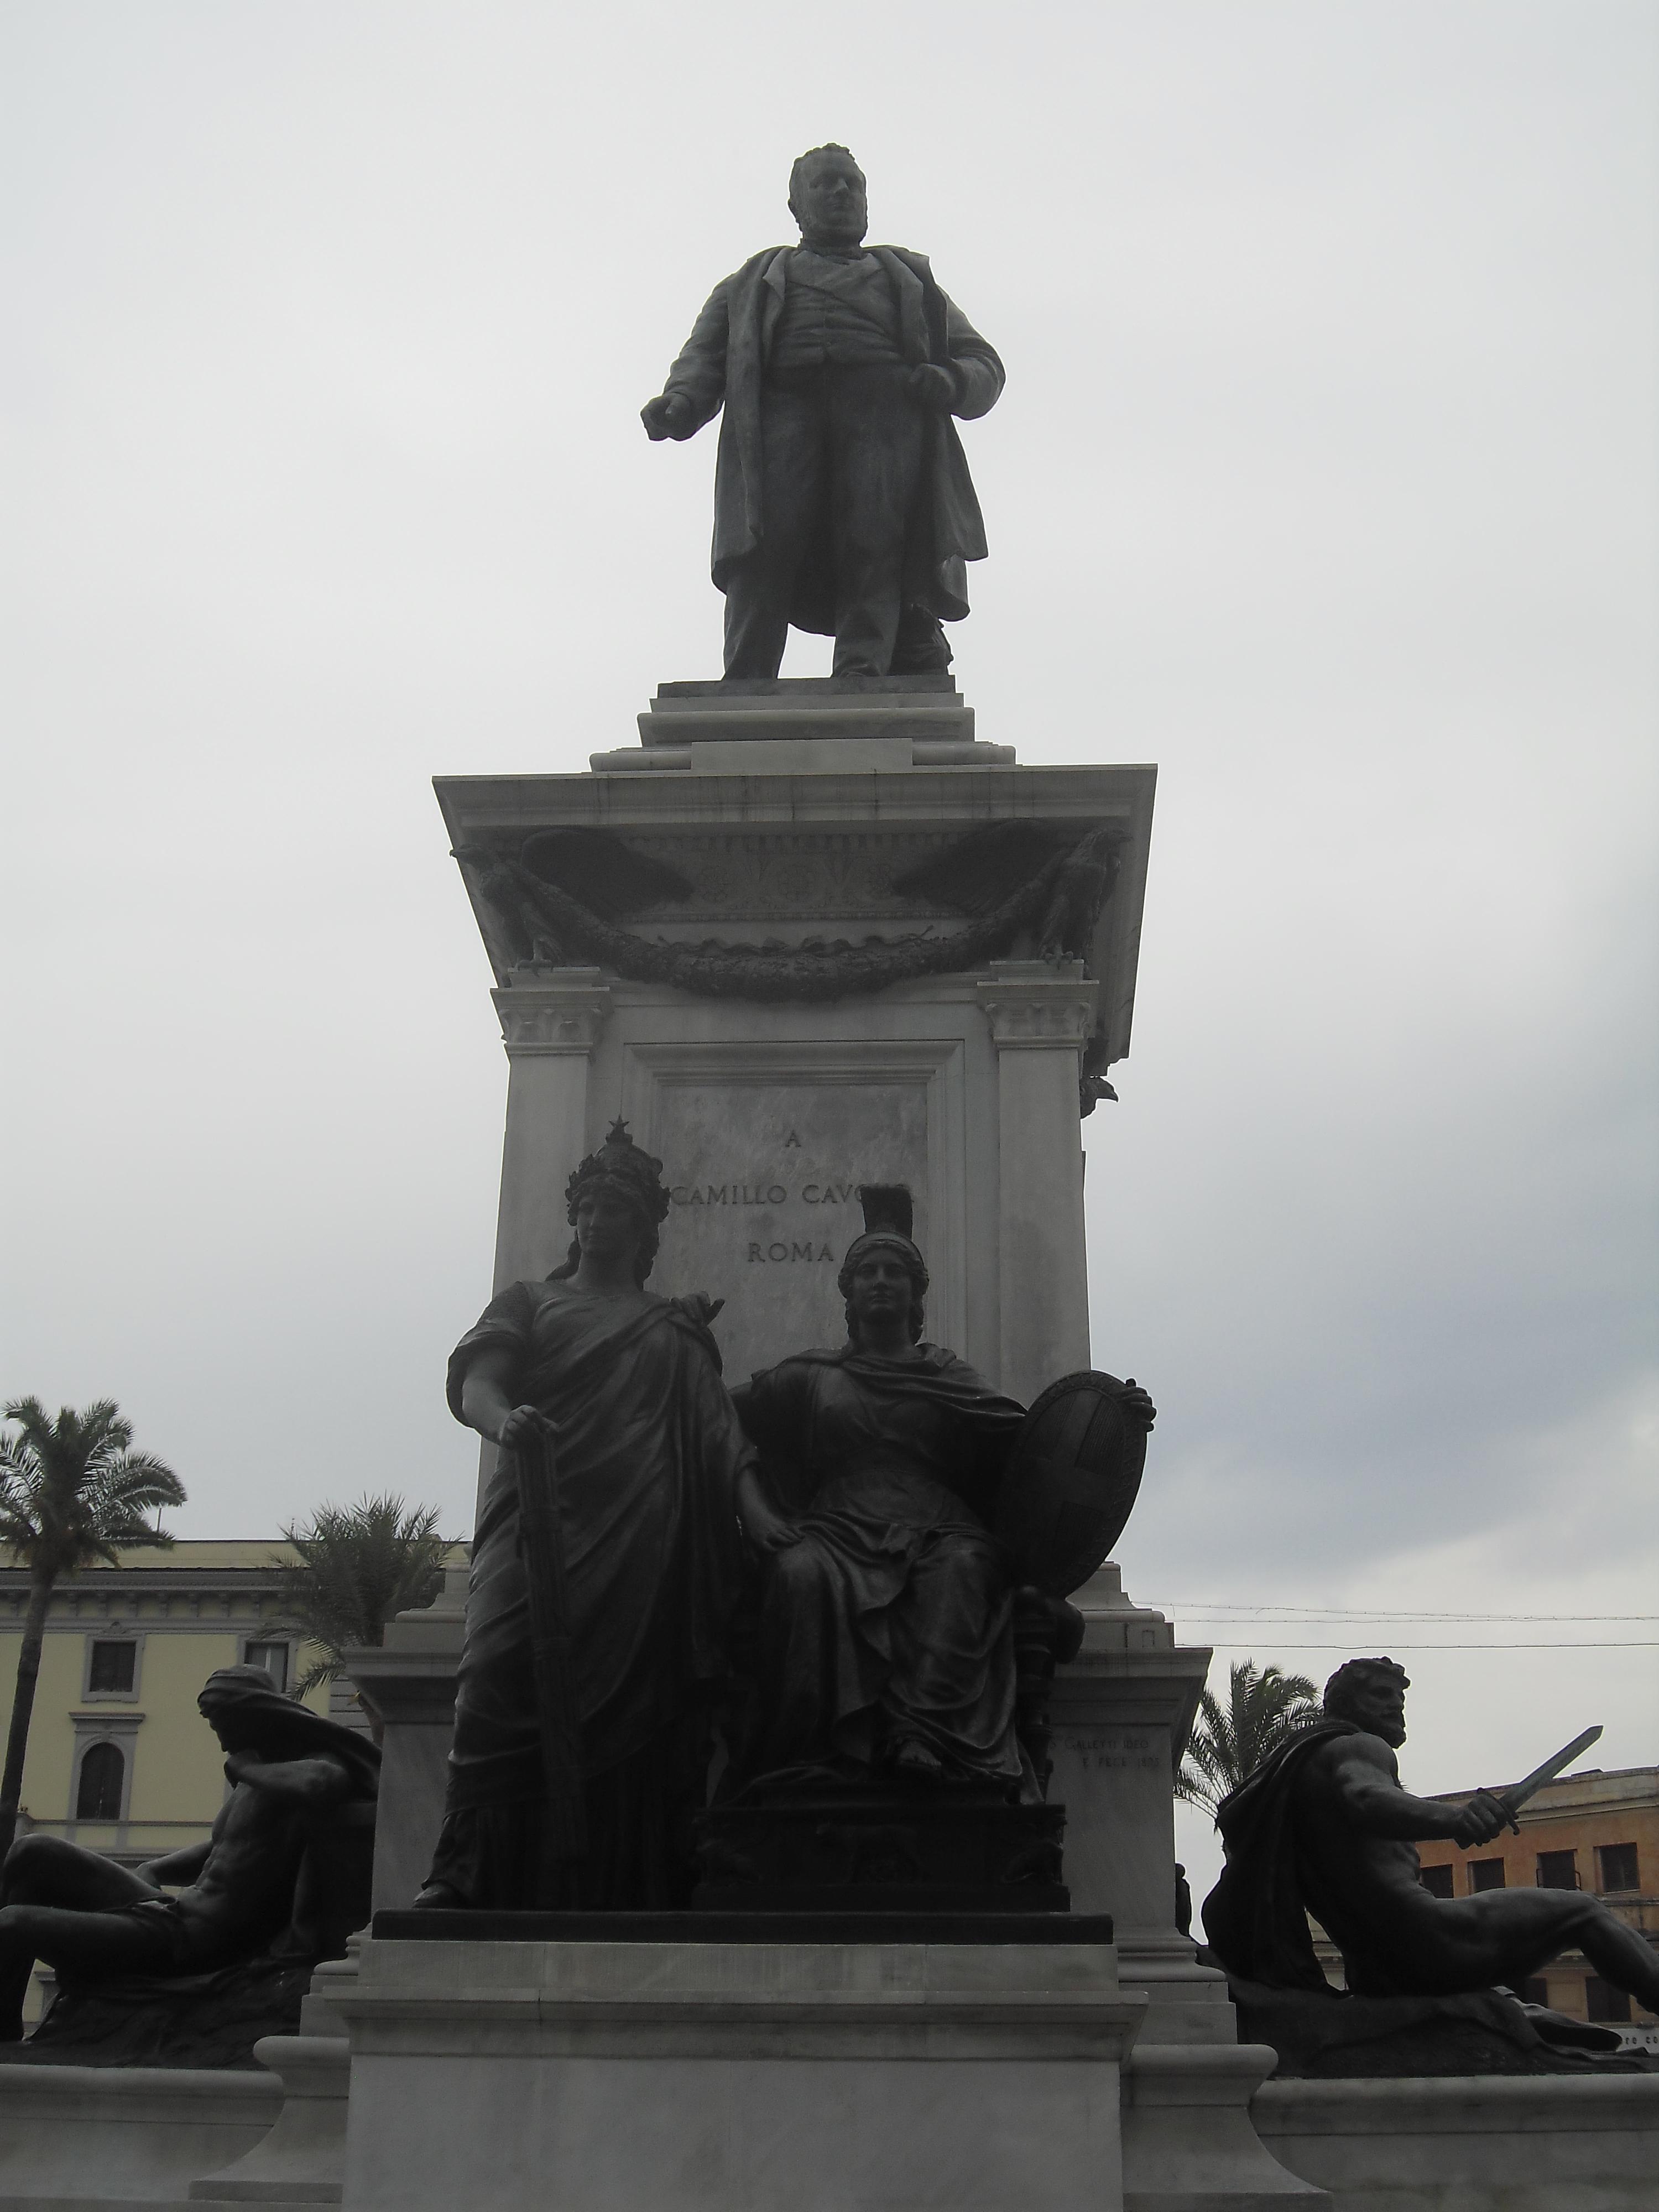 roma-piazza-cavour-statue-cavour-aug13